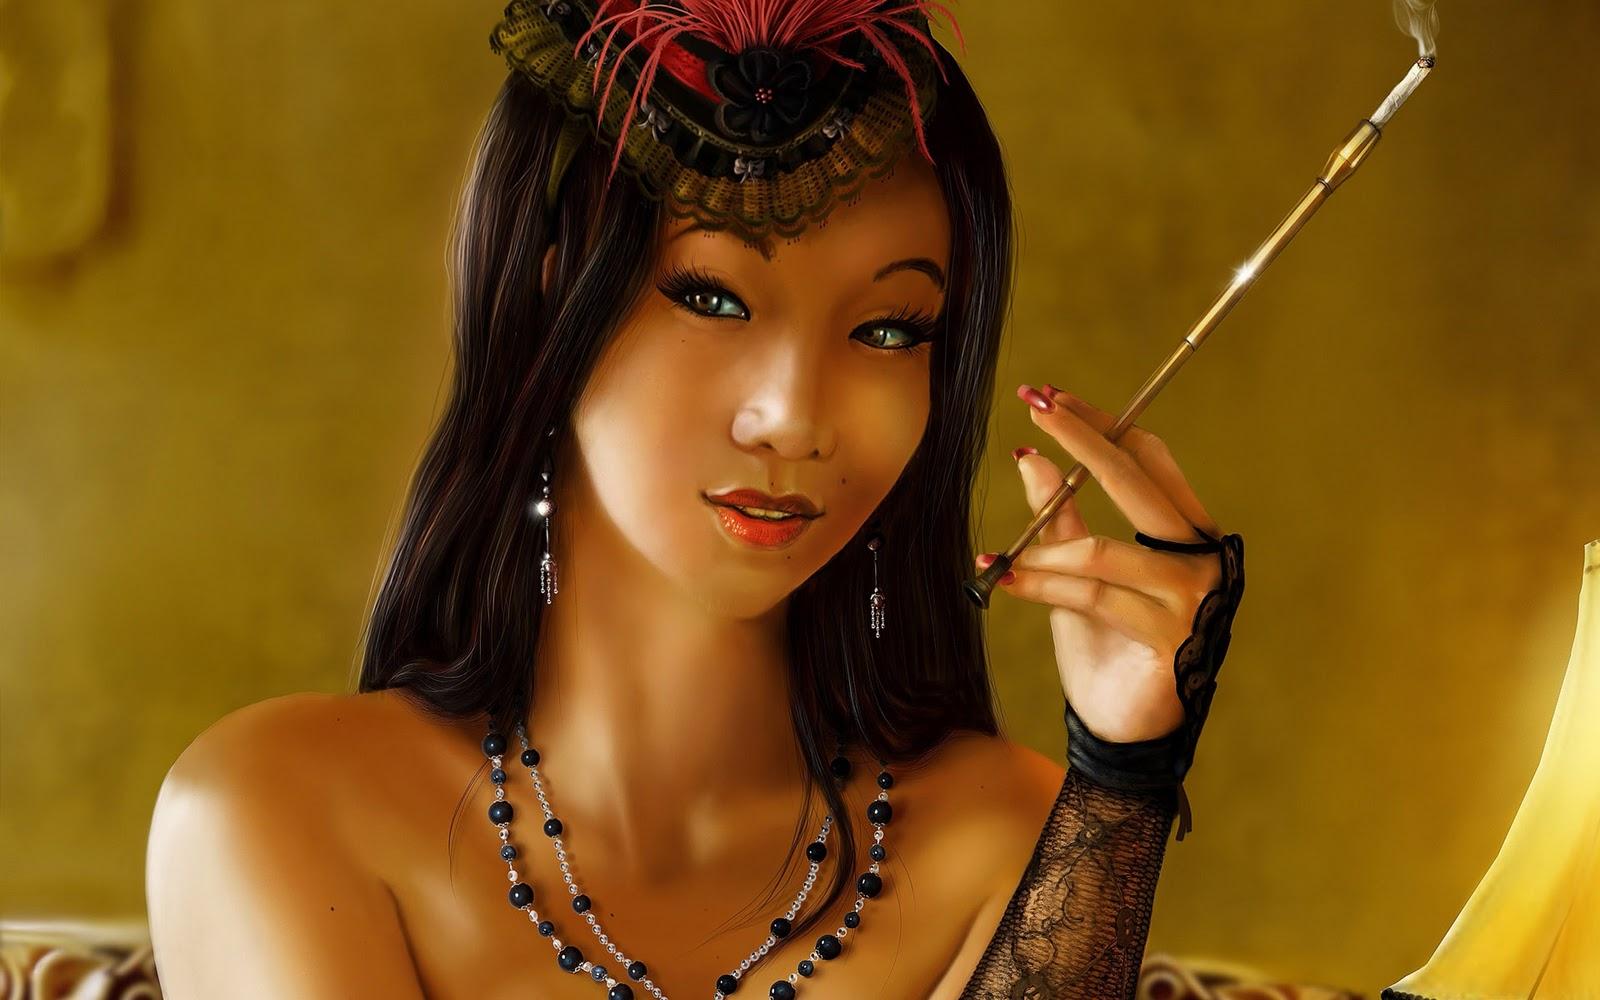 http://3.bp.blogspot.com/_lpyY1akuLxE/TSQx0YpZ5hI/AAAAAAAAAXA/ddKqM5QfN6g/s1600/wallpaper-desktop-by-freewallapaperstock.blogspot.com%2B%25252839%252529.jpg